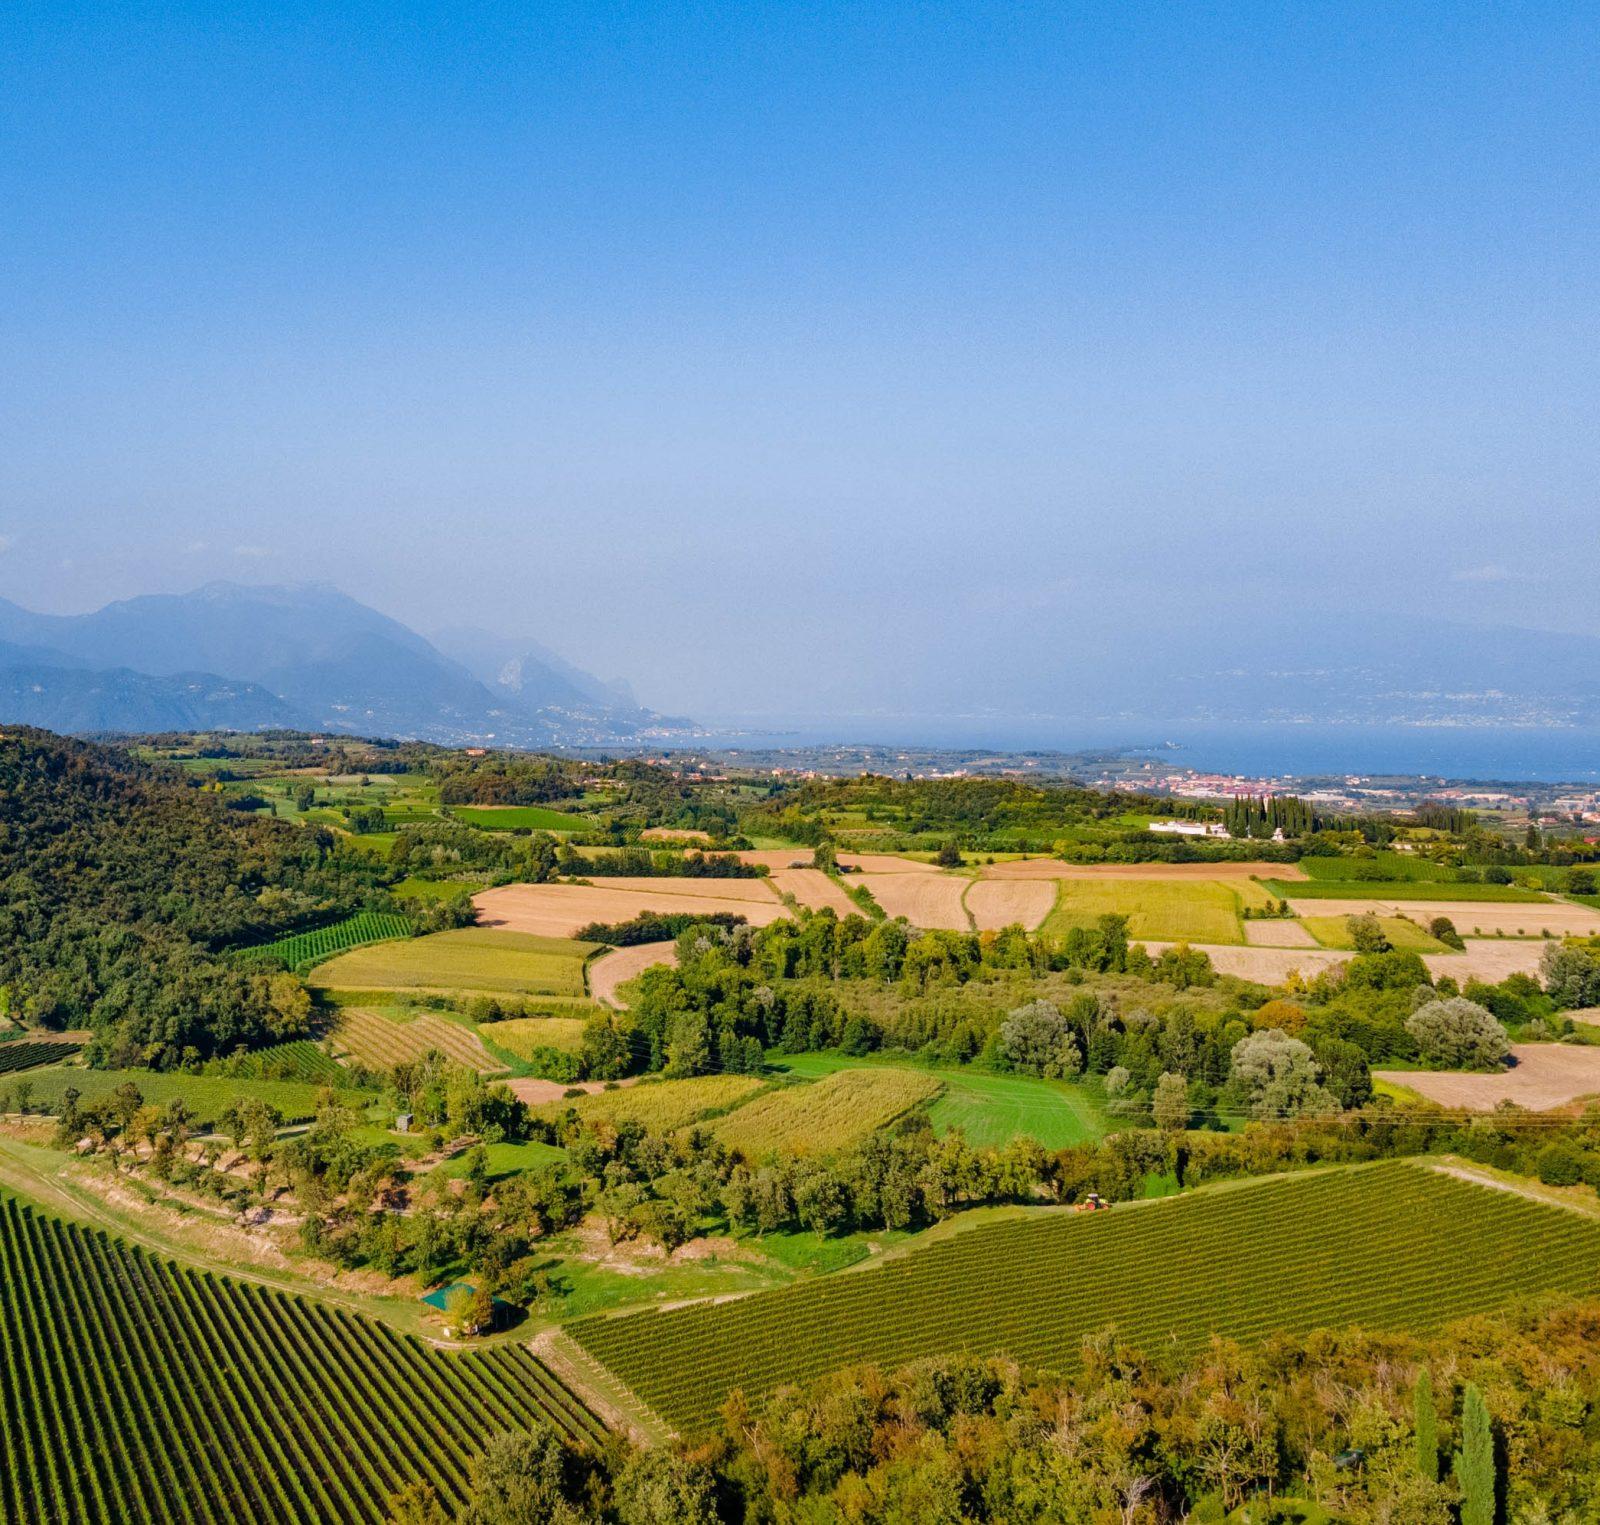 Valtènesi, lago di Garda